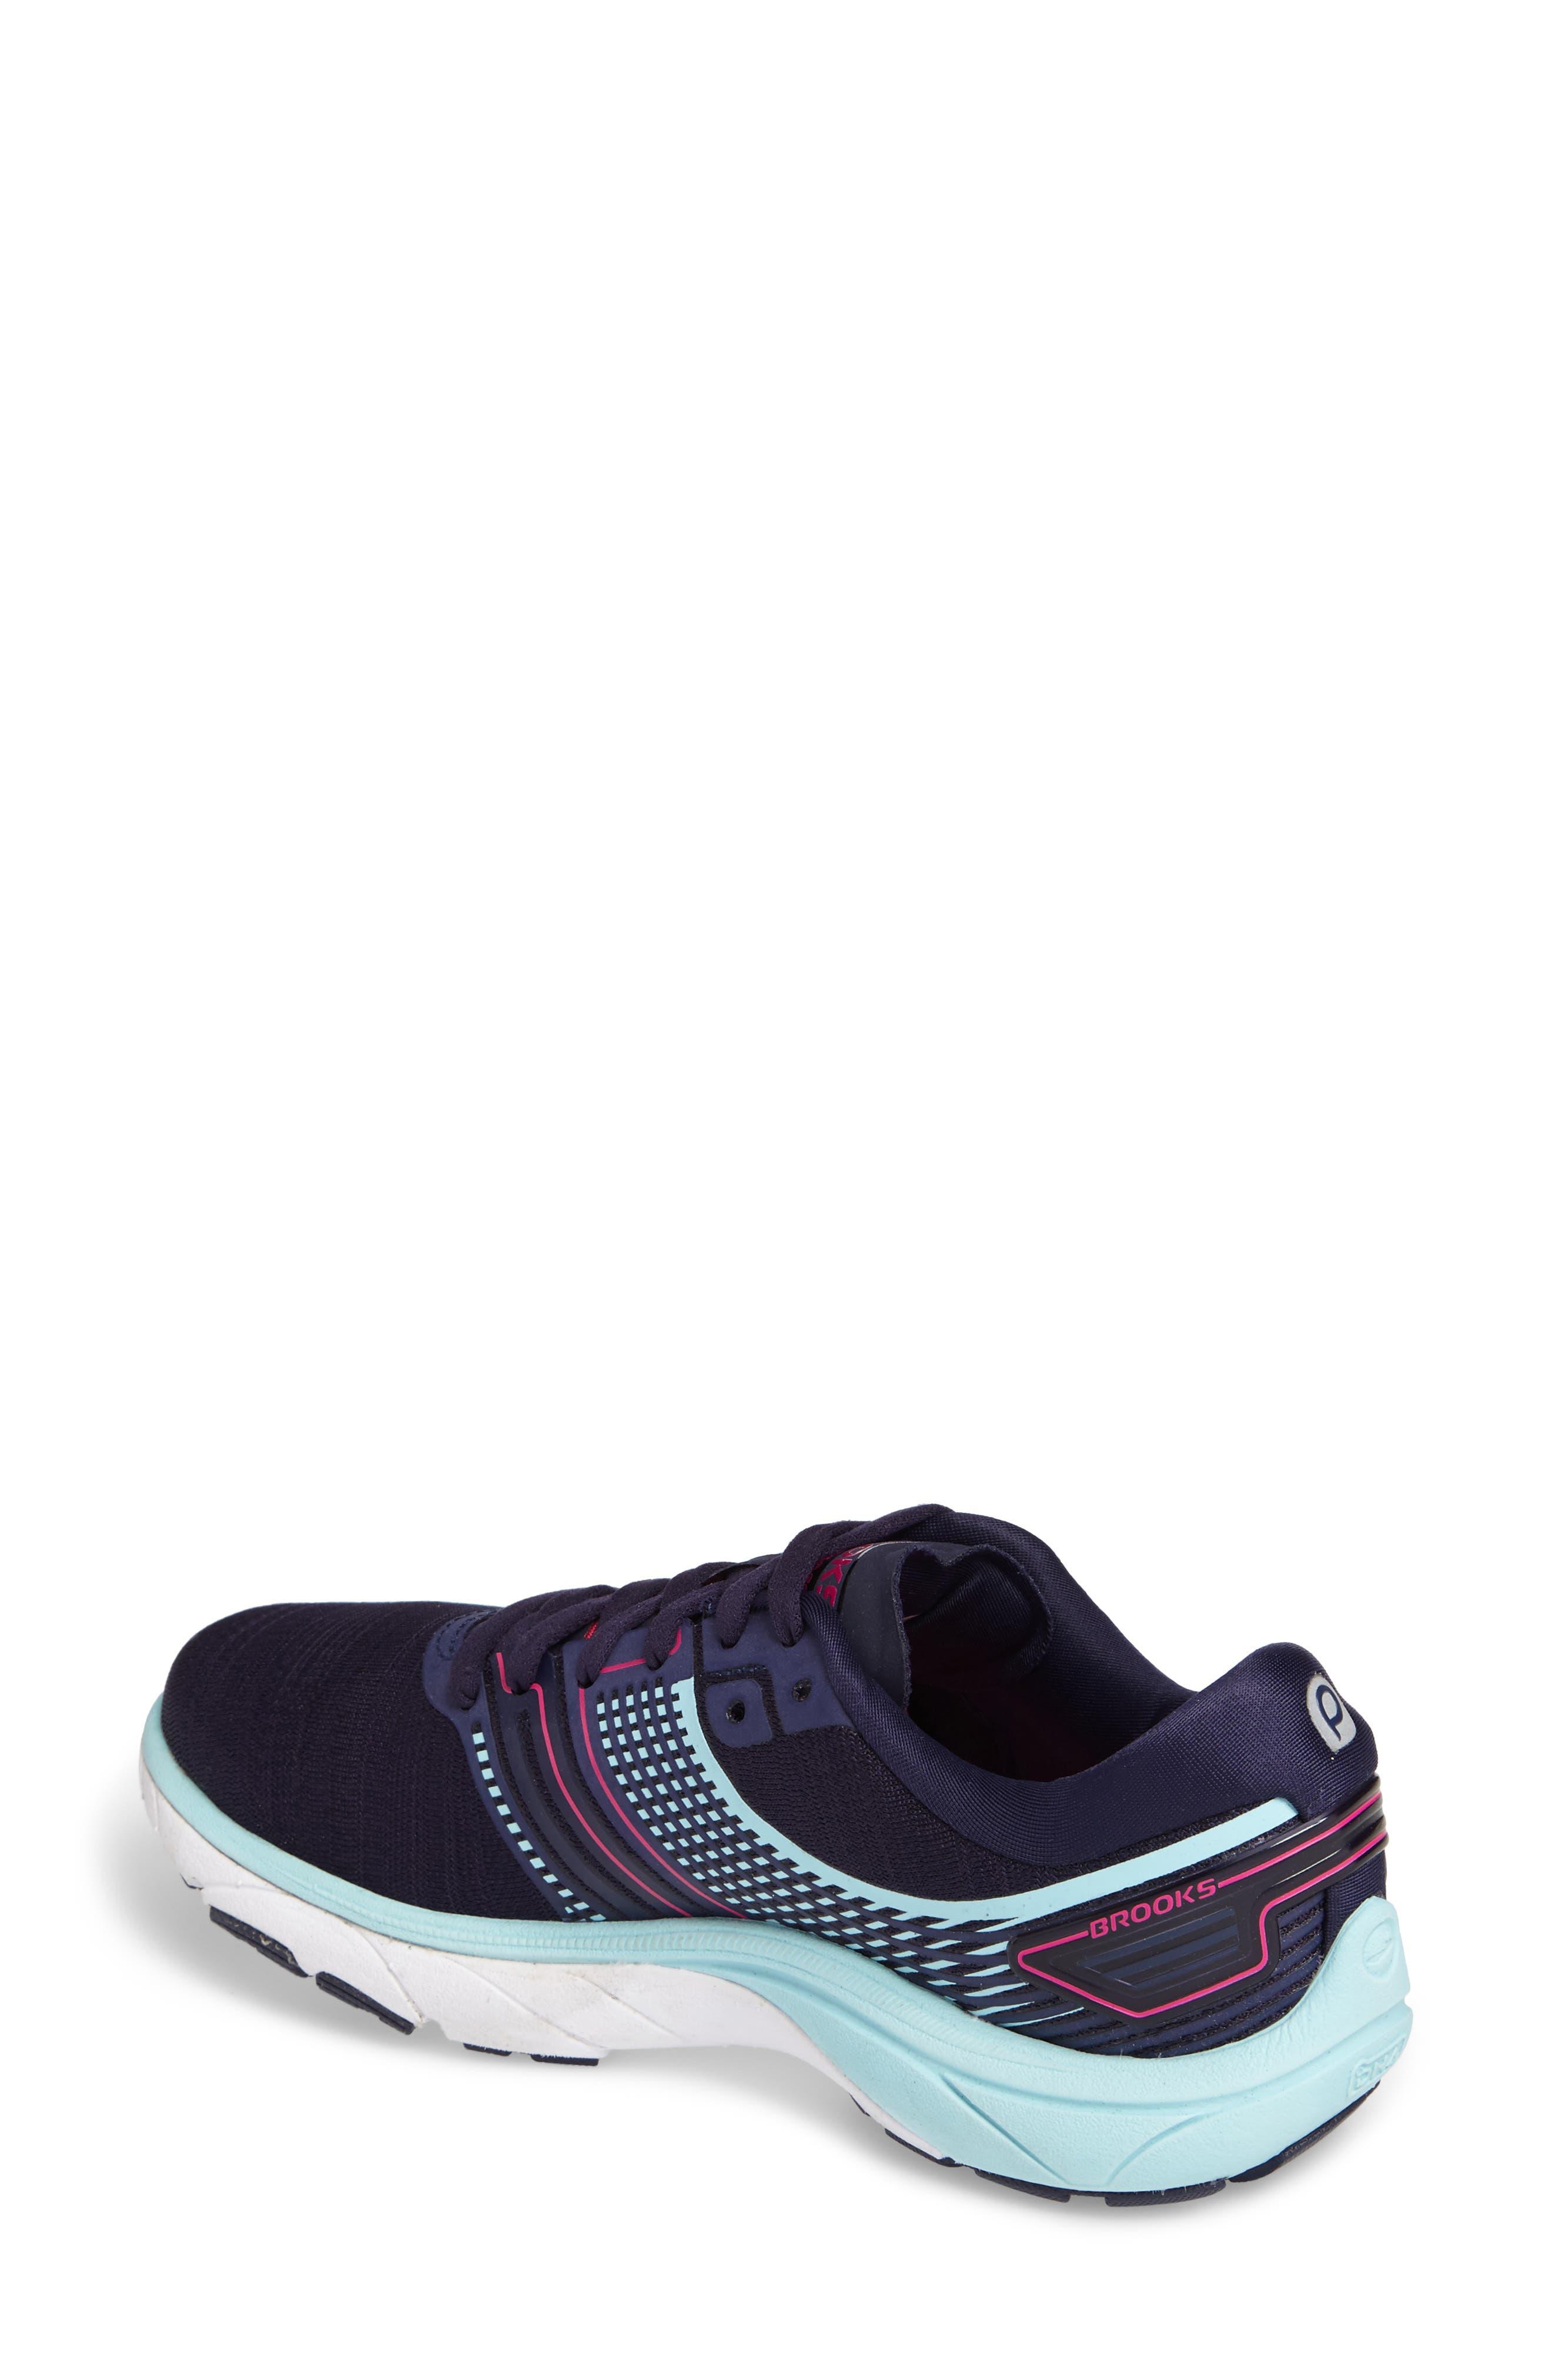 PureCadence 6 Running Shoe,                             Alternate thumbnail 2, color,                             435